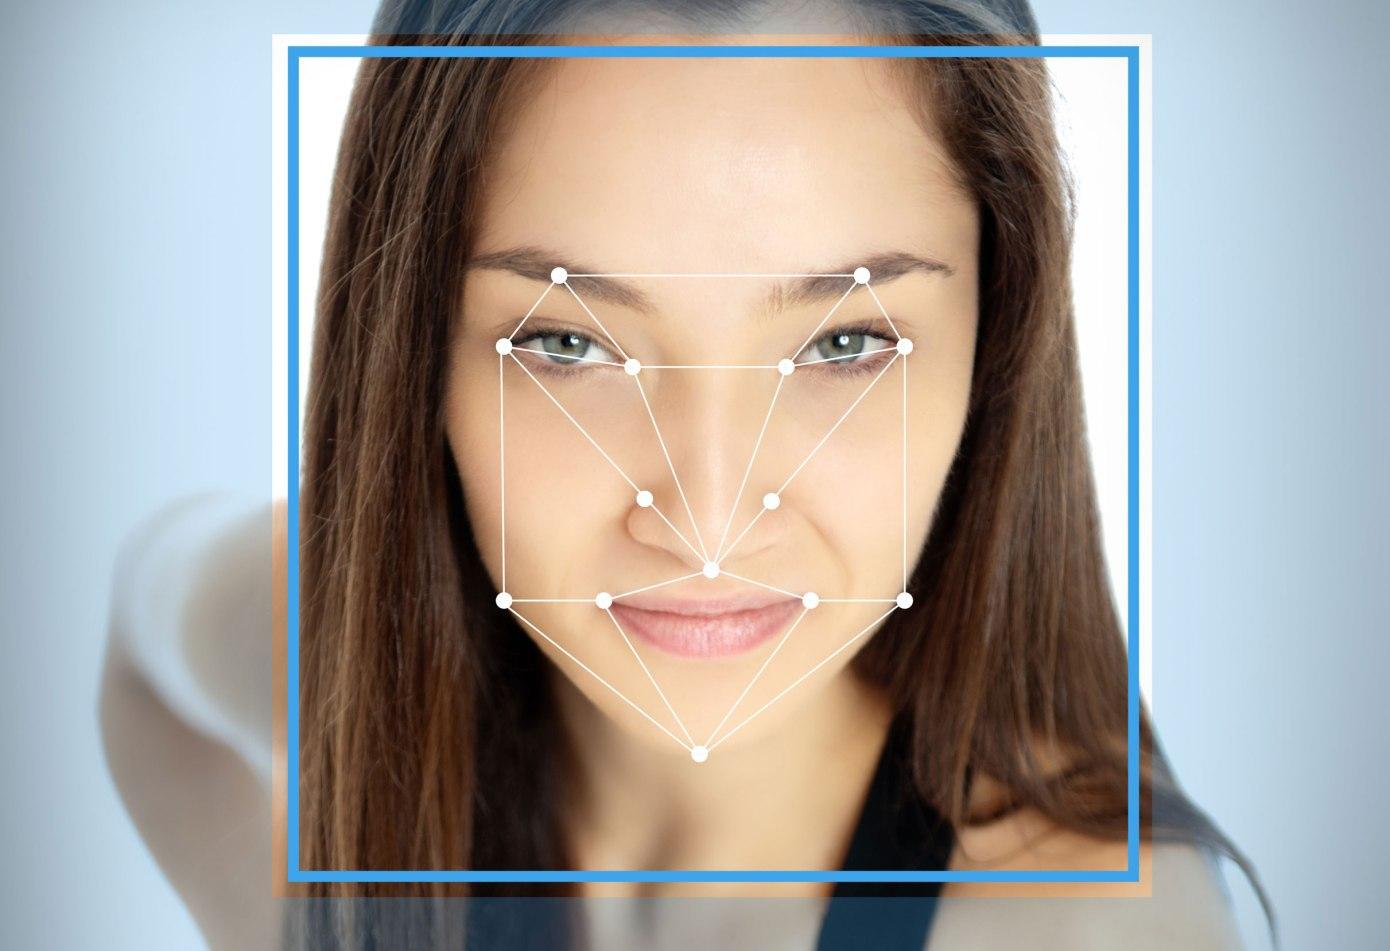 https://www.dotmug.net/wp-content/uploads/2018/04/facebook-riconoscimento-facciale.jpg